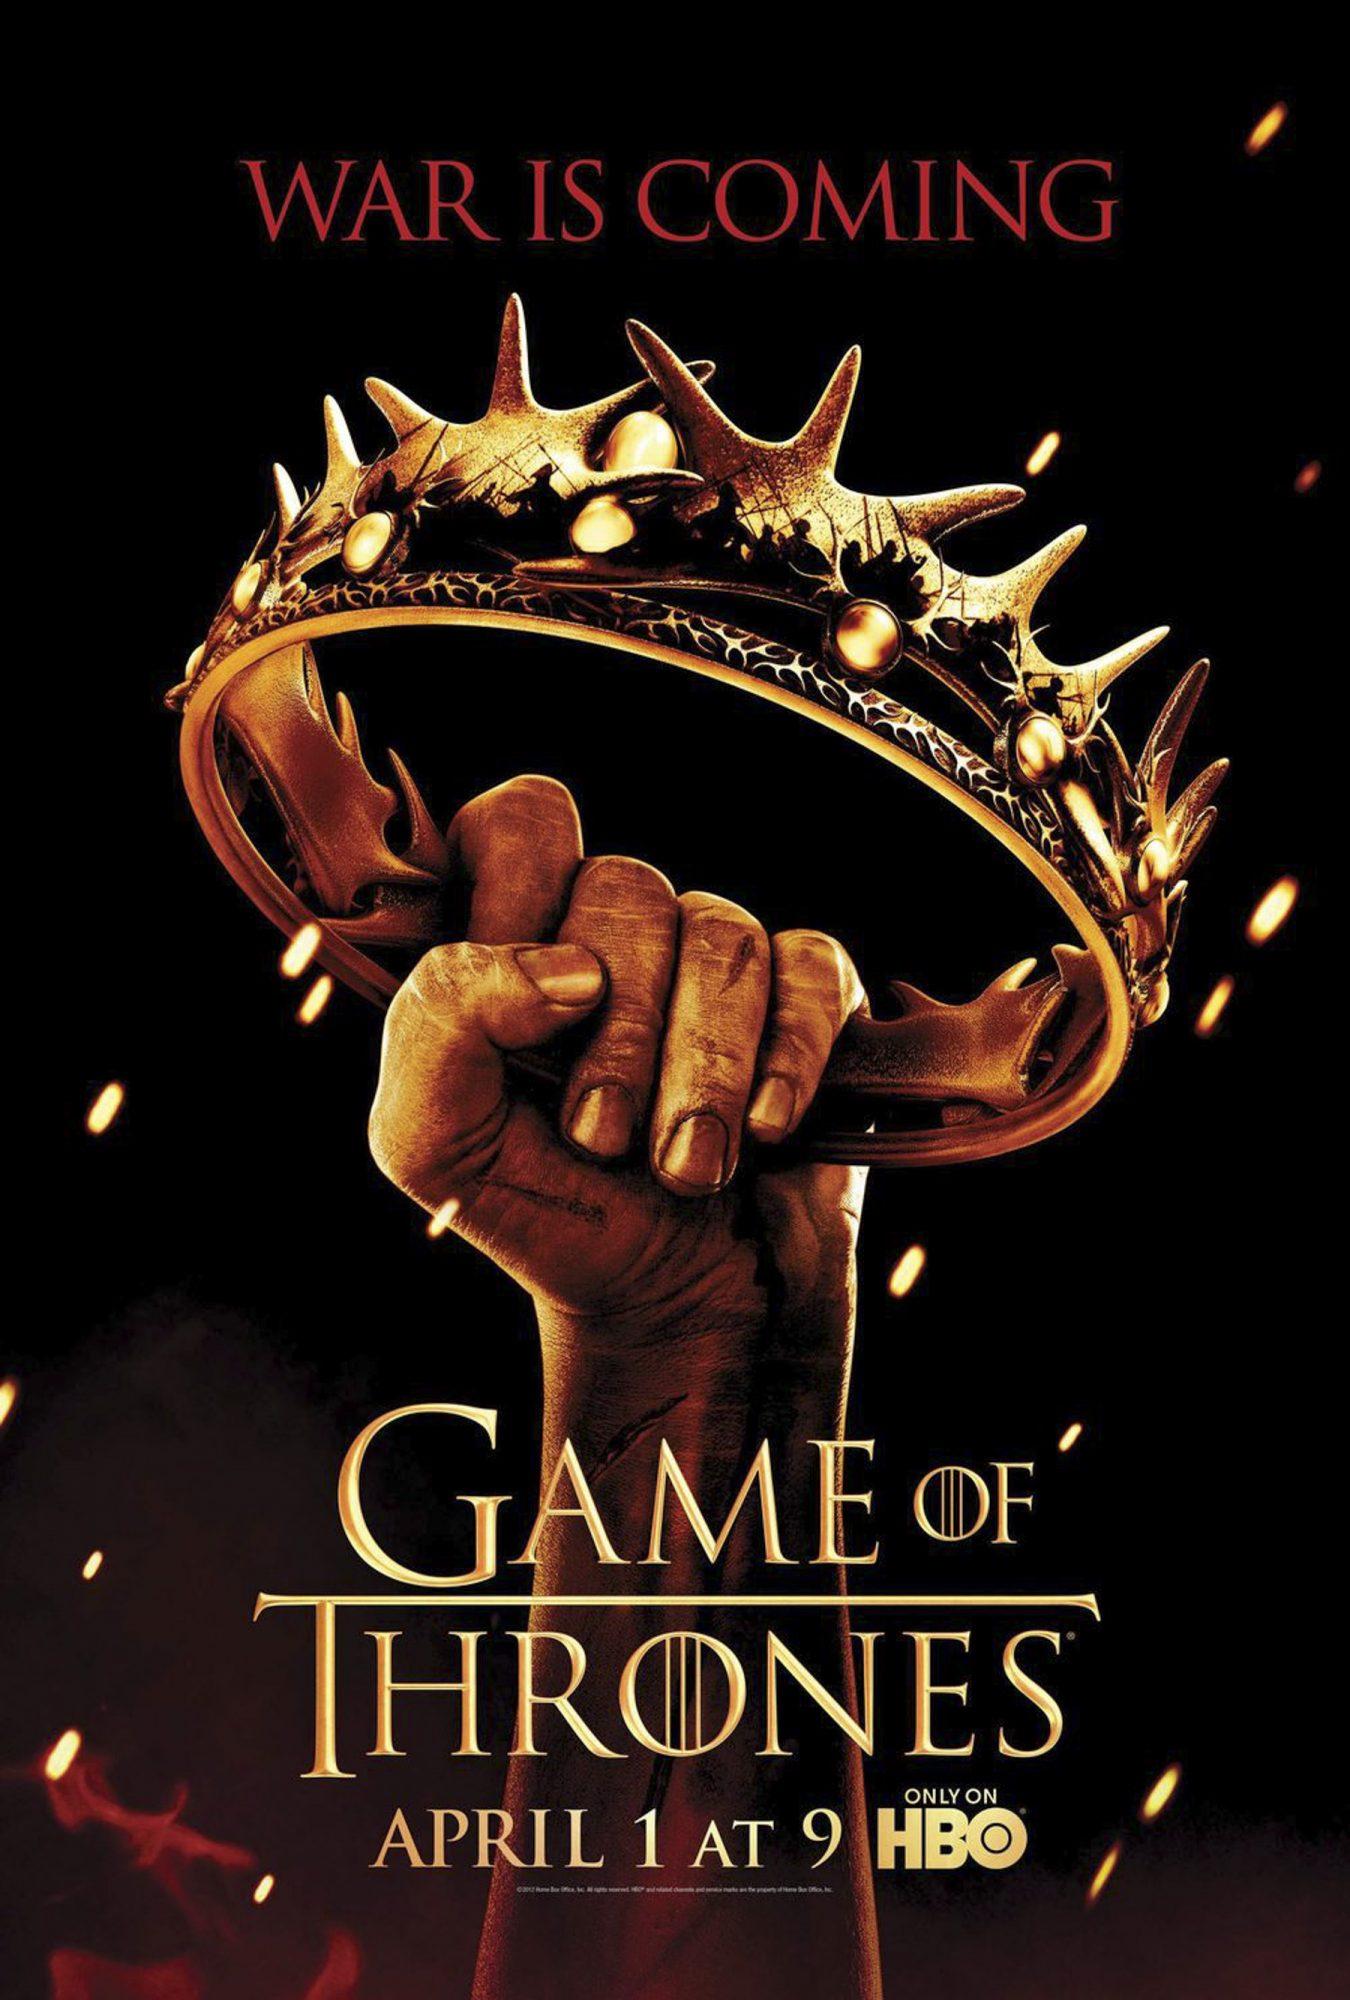 Game of Thrones poster/key artSeason 2CR: HBO